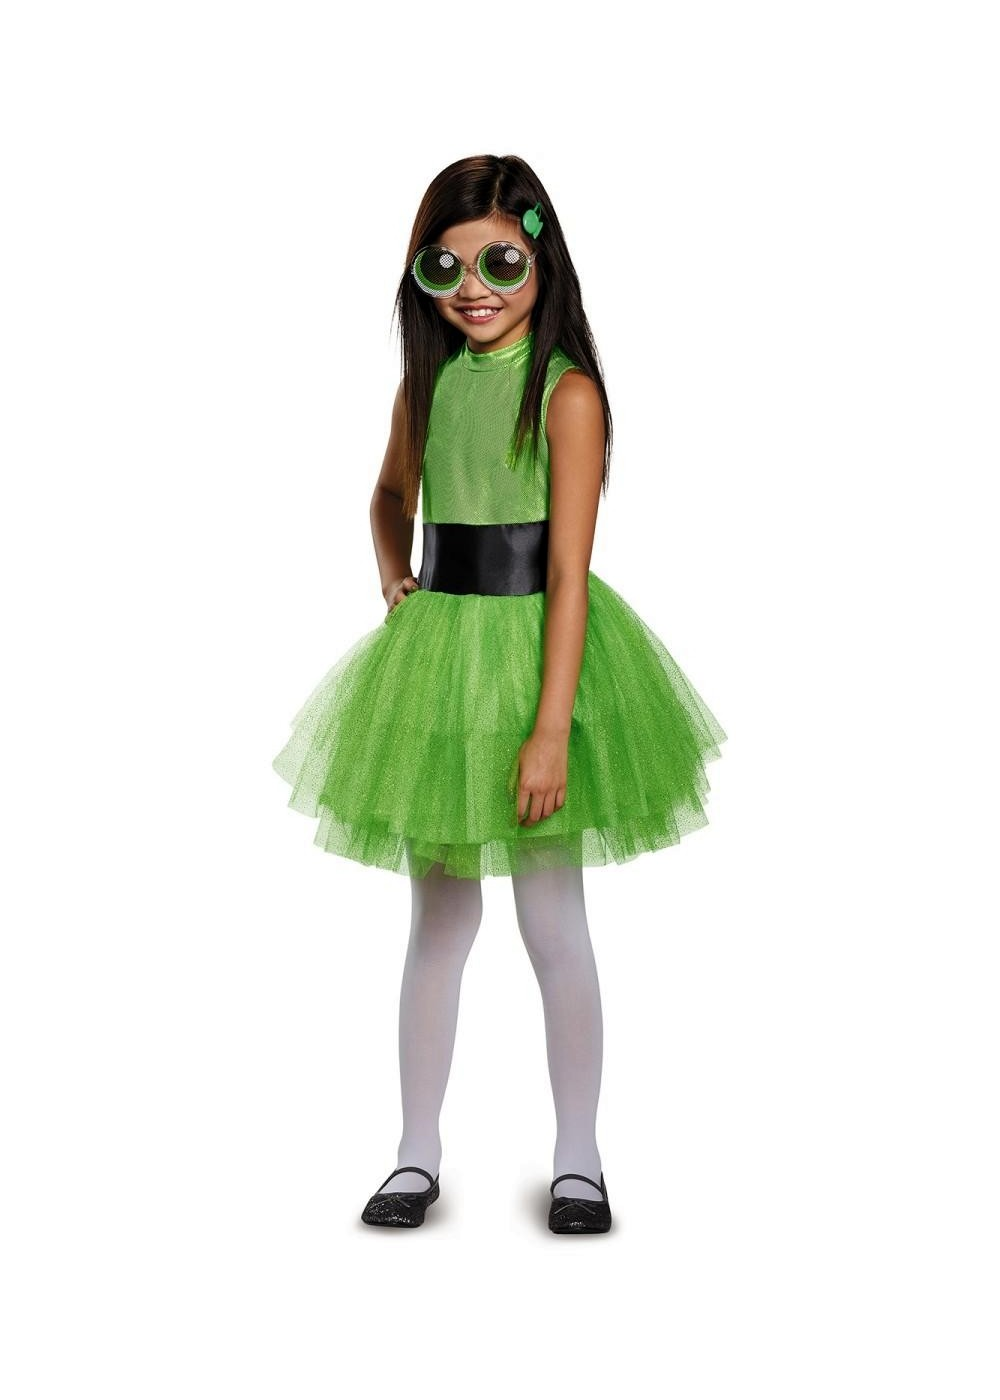 Buttercup Powerpuff Girls Costume  sc 1 st  Halloween Costumes & Buttercup Powerpuff Girls Costume - TV Show Costumes